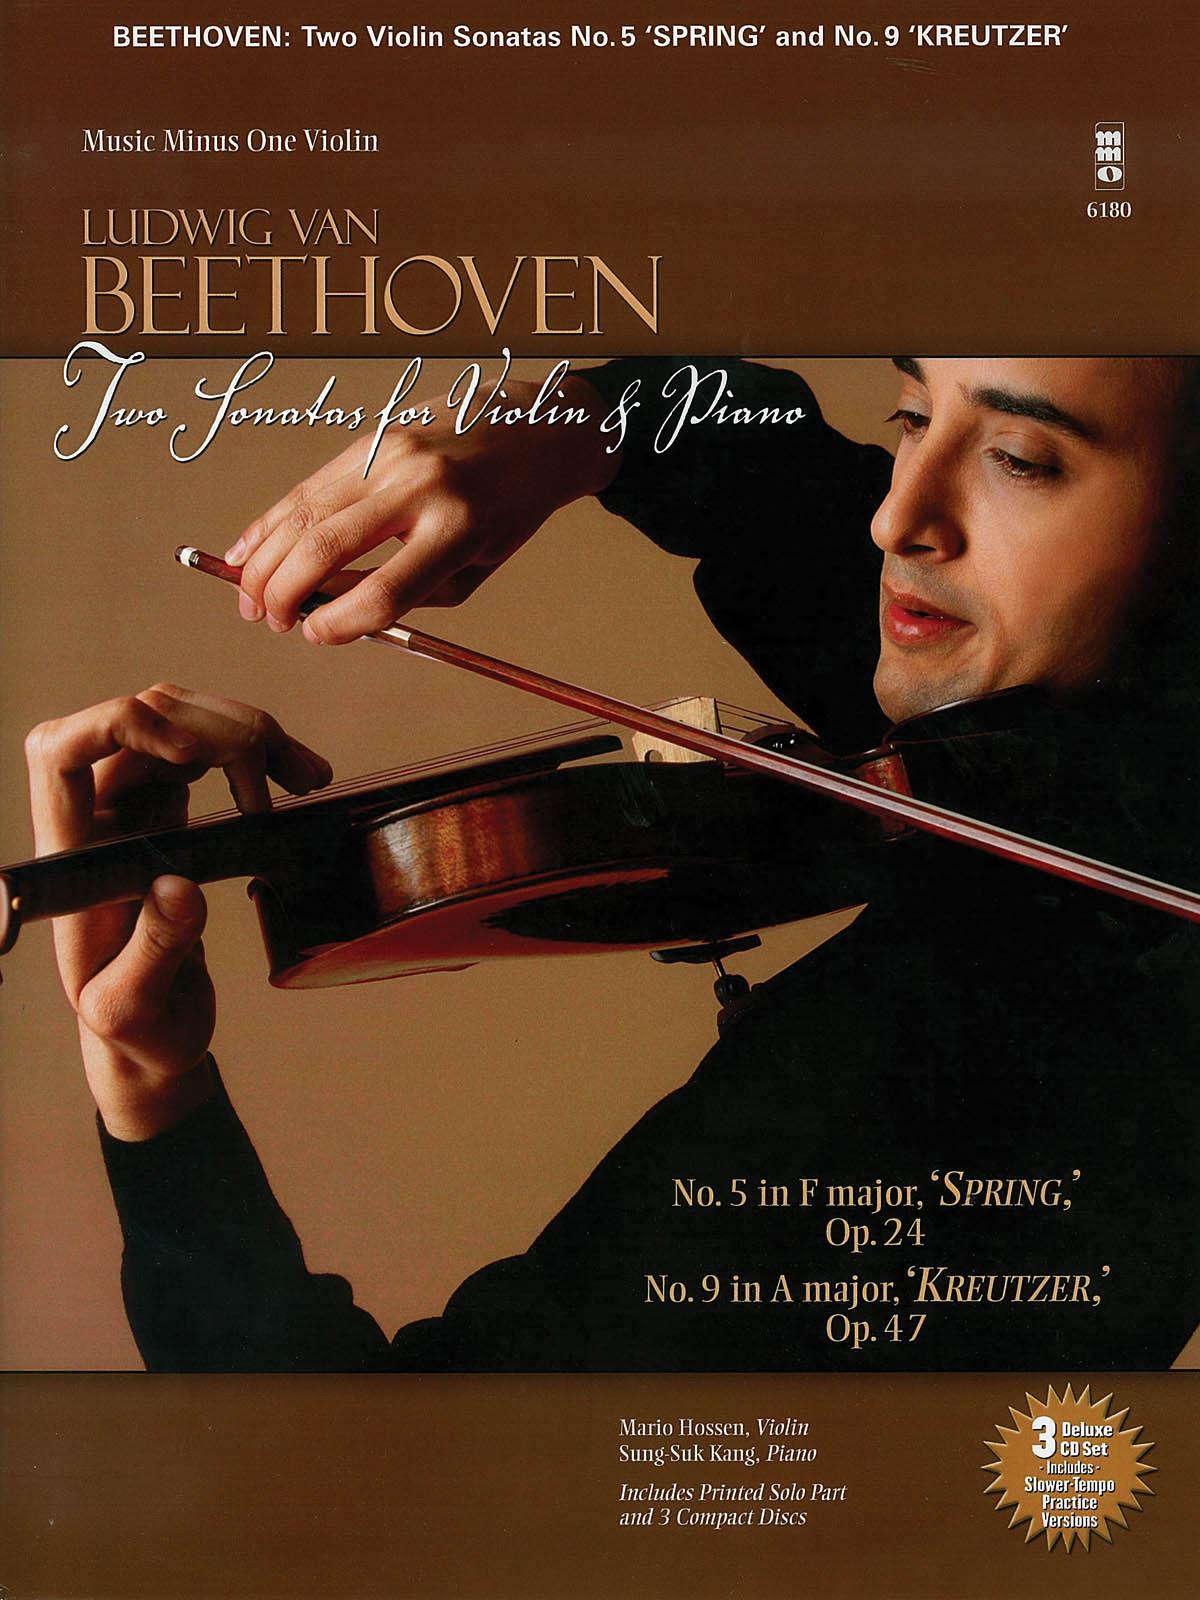 Ludwig van Beethoven: Beethoven - Two Sonatas for Violin and Piano: Violin and